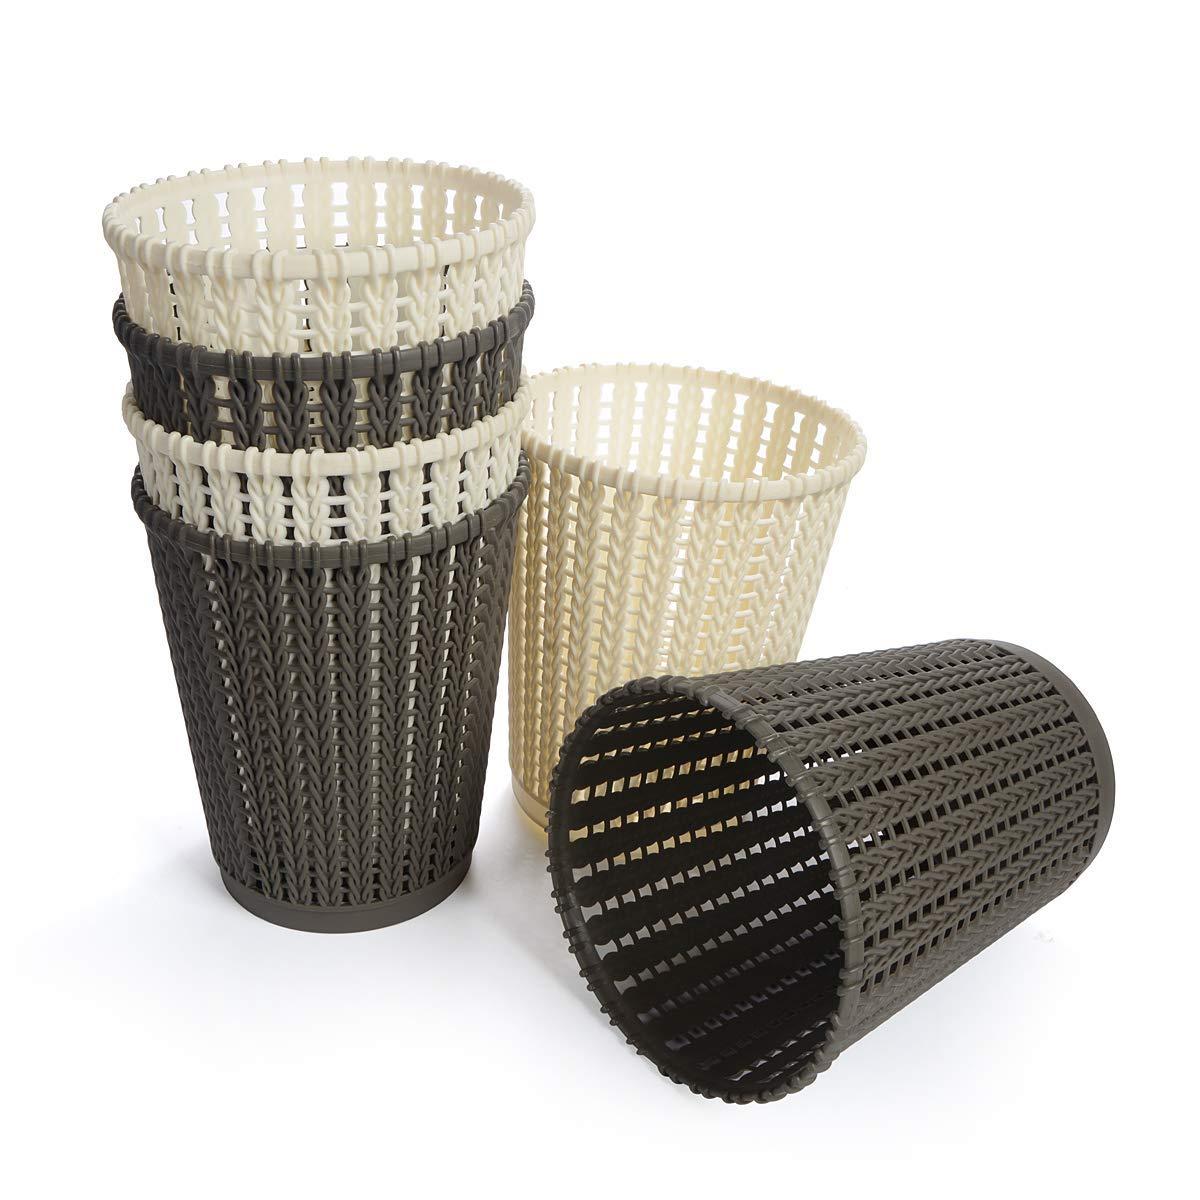 Saim Rattan Waste Basket Plastic Woven Household Paper Wastebasket Trash Can Garbage Waste Bin Container for Kitchen, Hotel, Office, Bedroom, Bathroom, Living Room